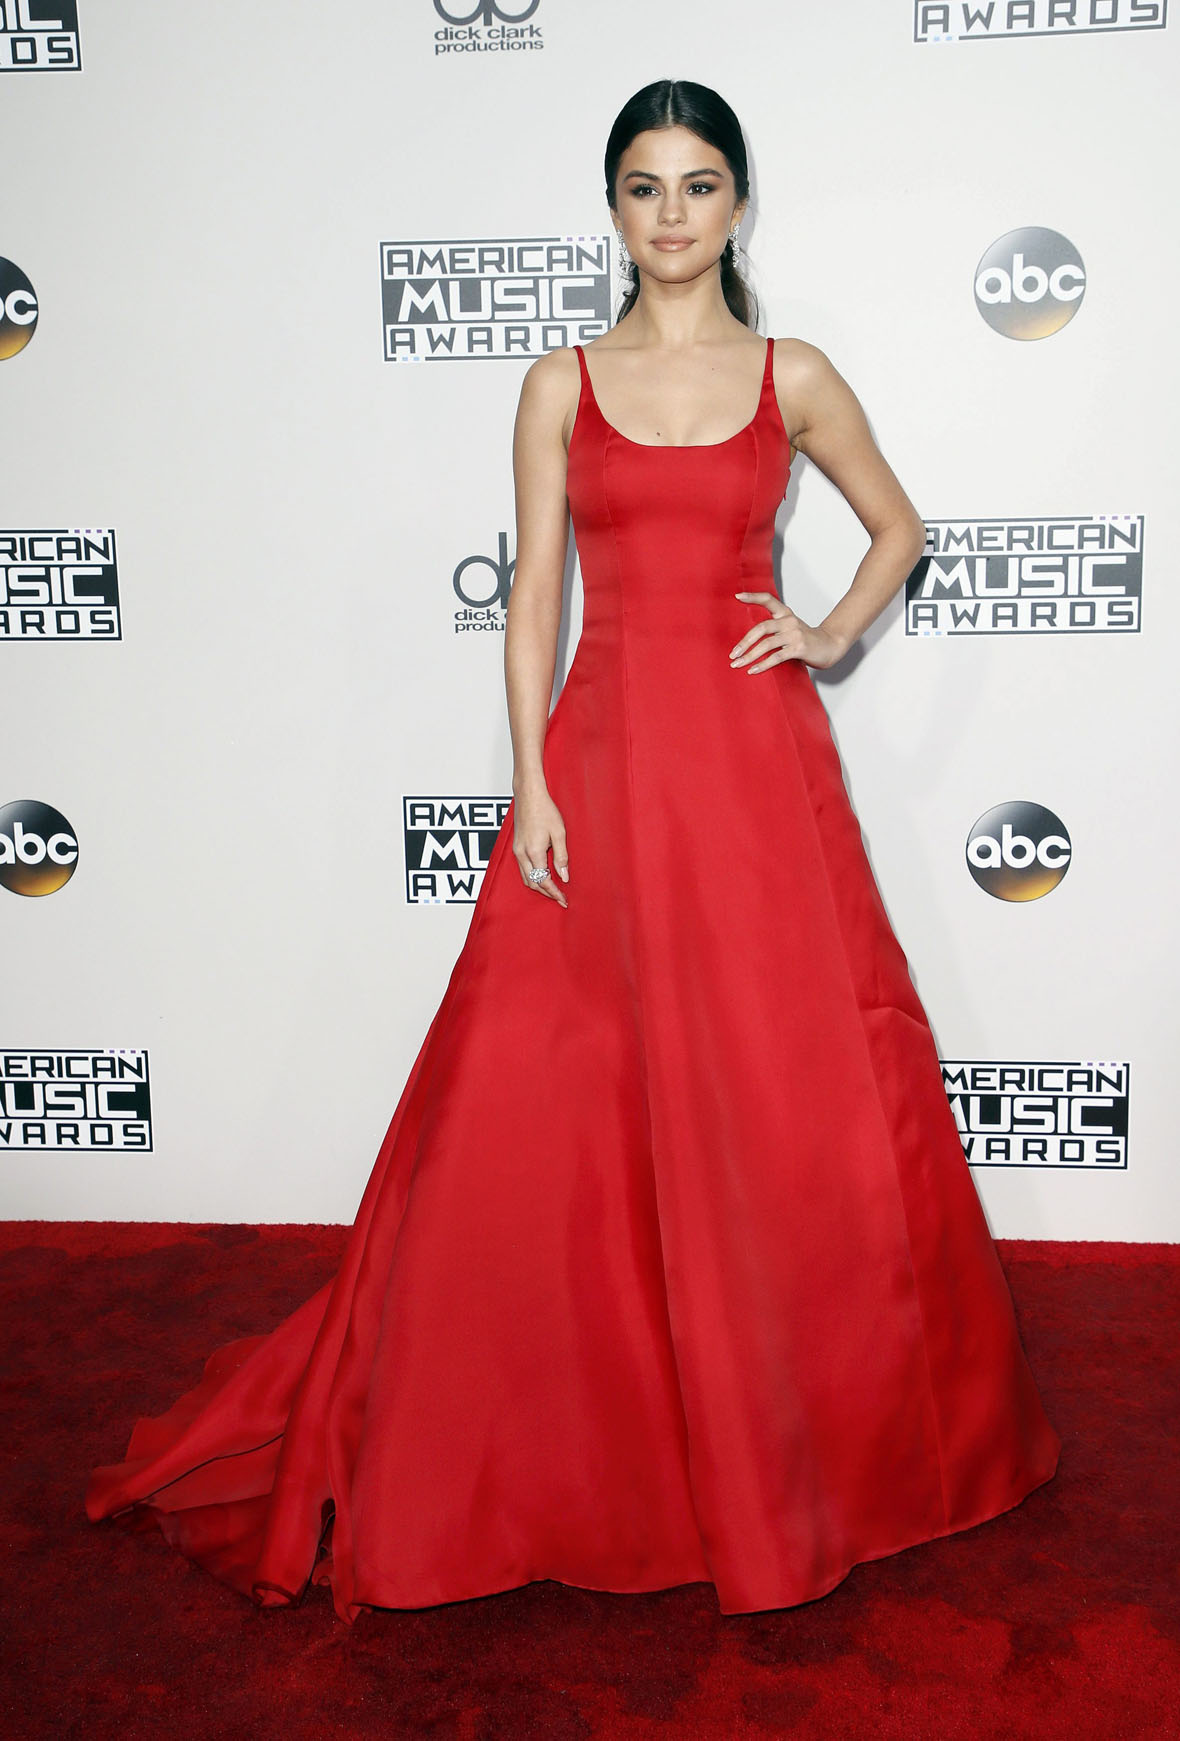 Singer Selena Gomez arrives at the 2016 American Music Awards in Los Angeles, California, U.S., November 20, 2016. REUTERS/Danny Moloshok